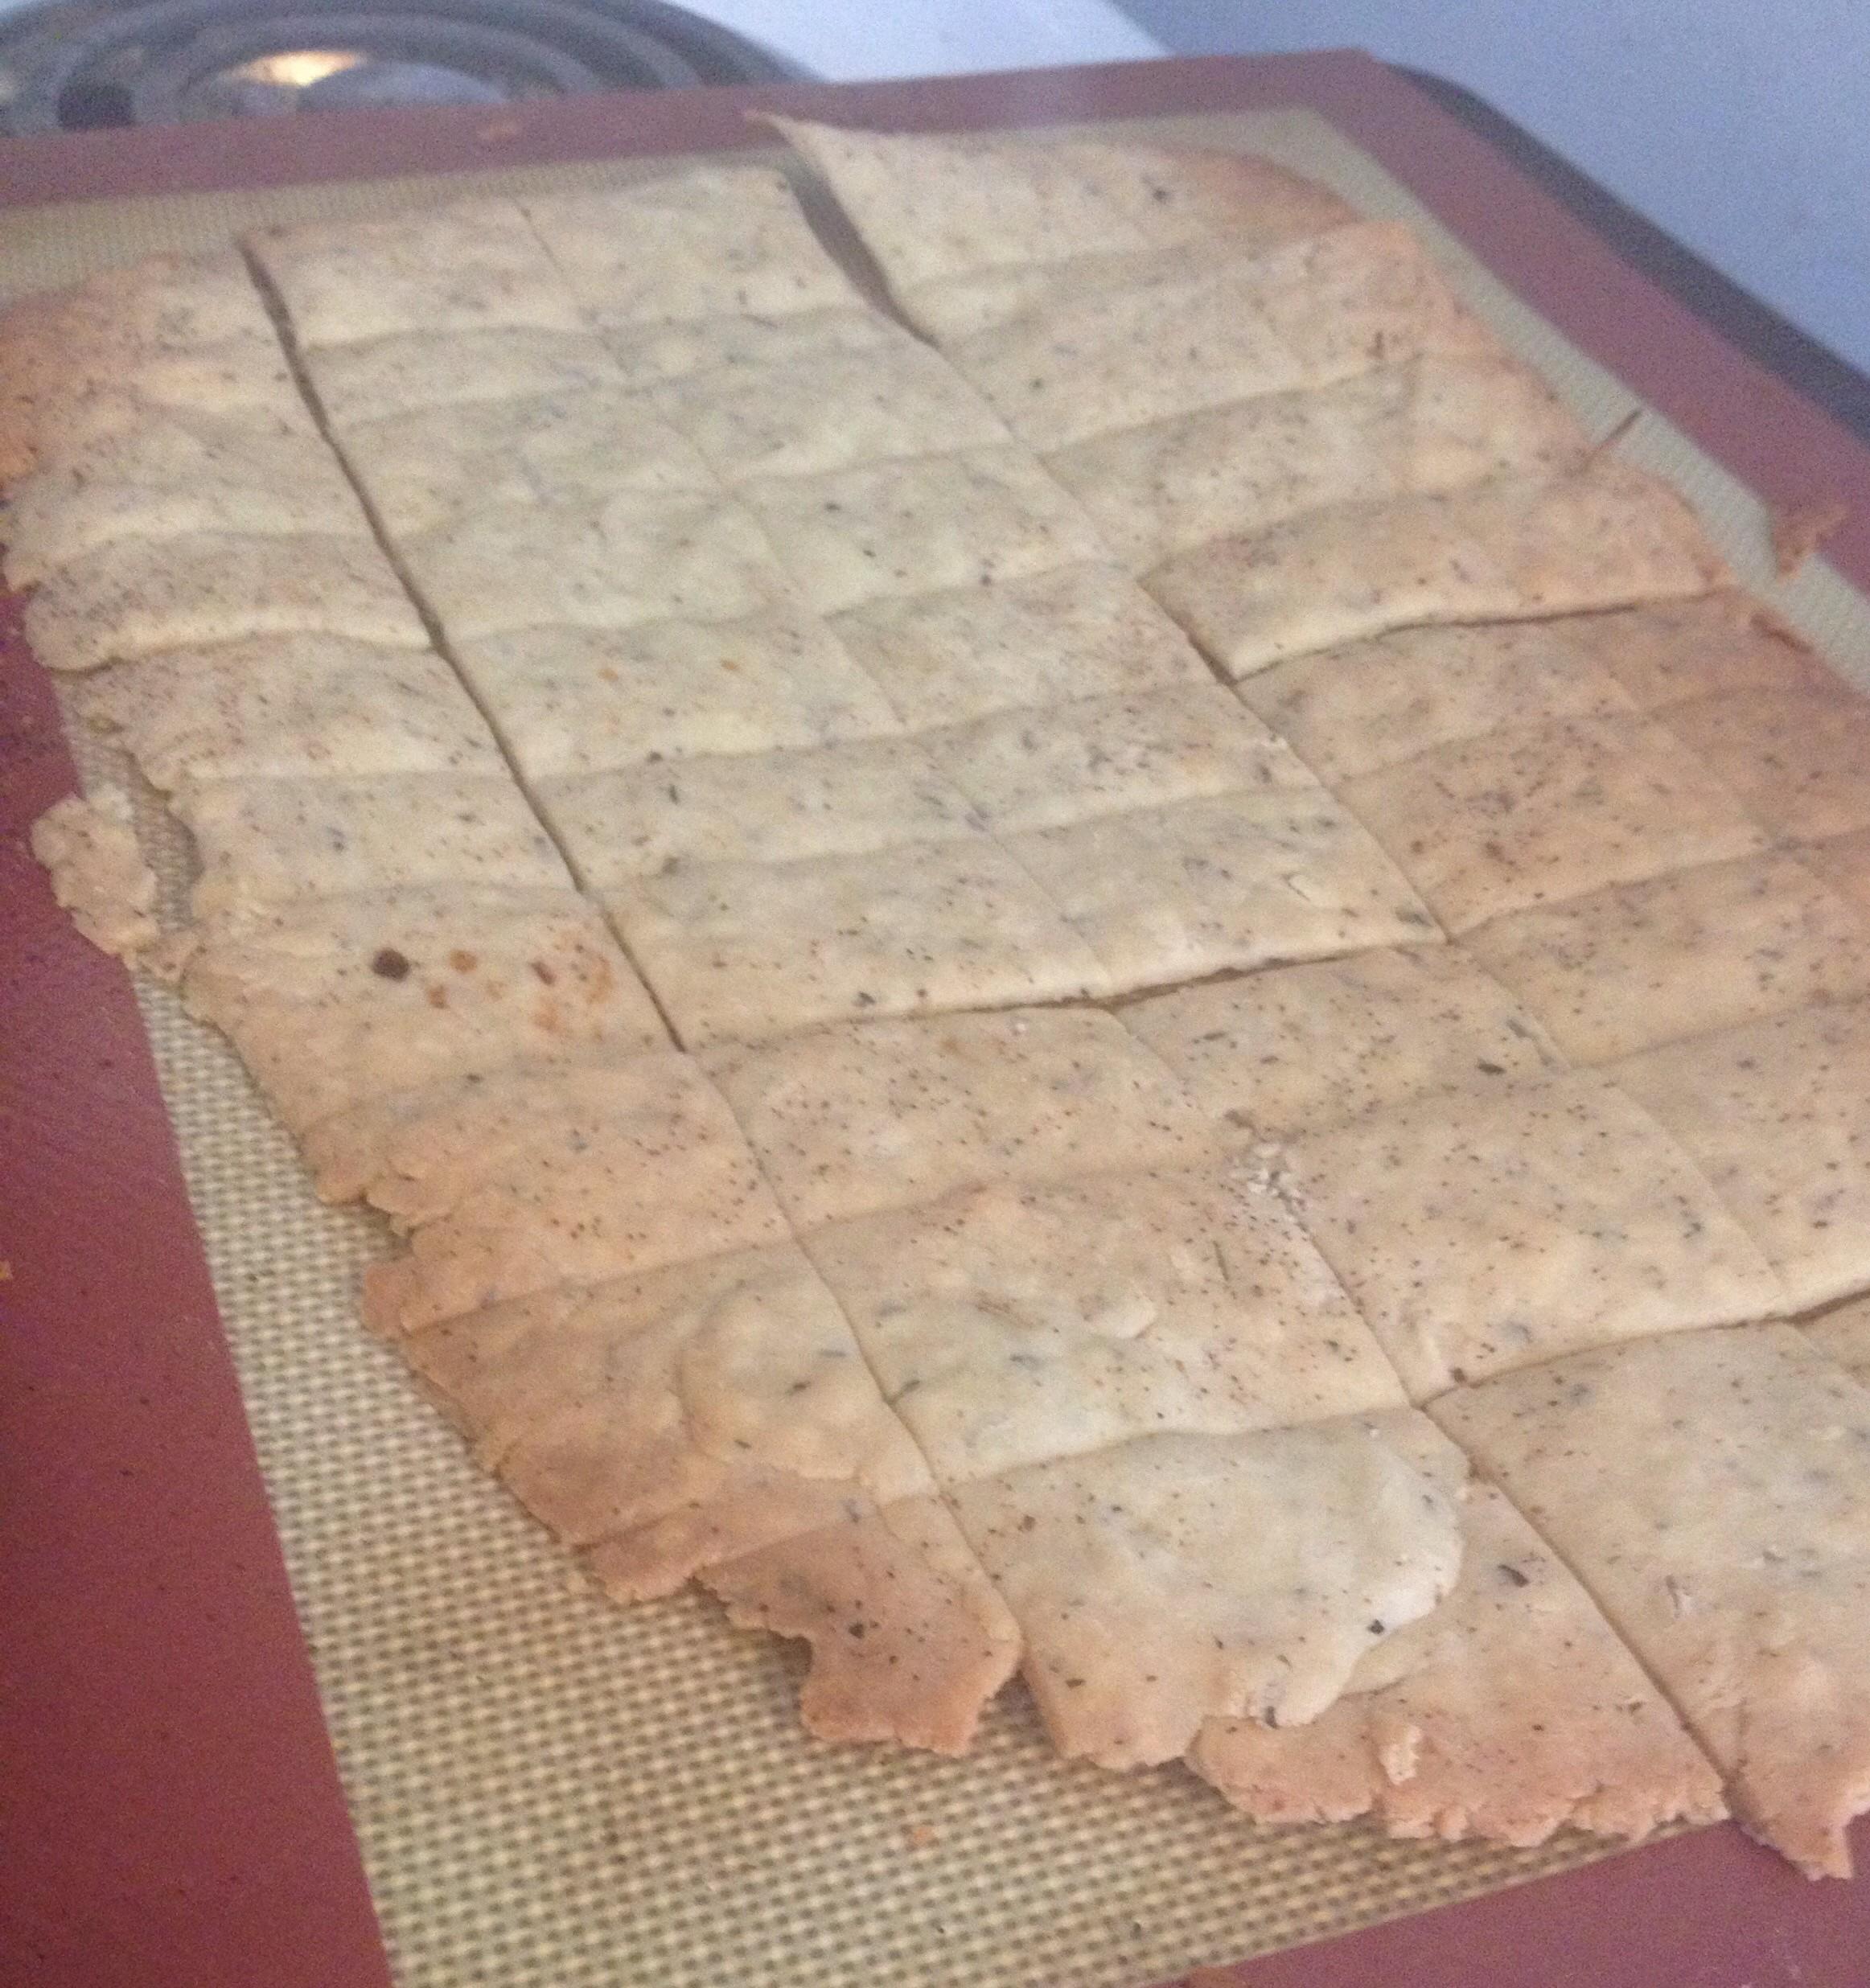 Baked gluten free crackers